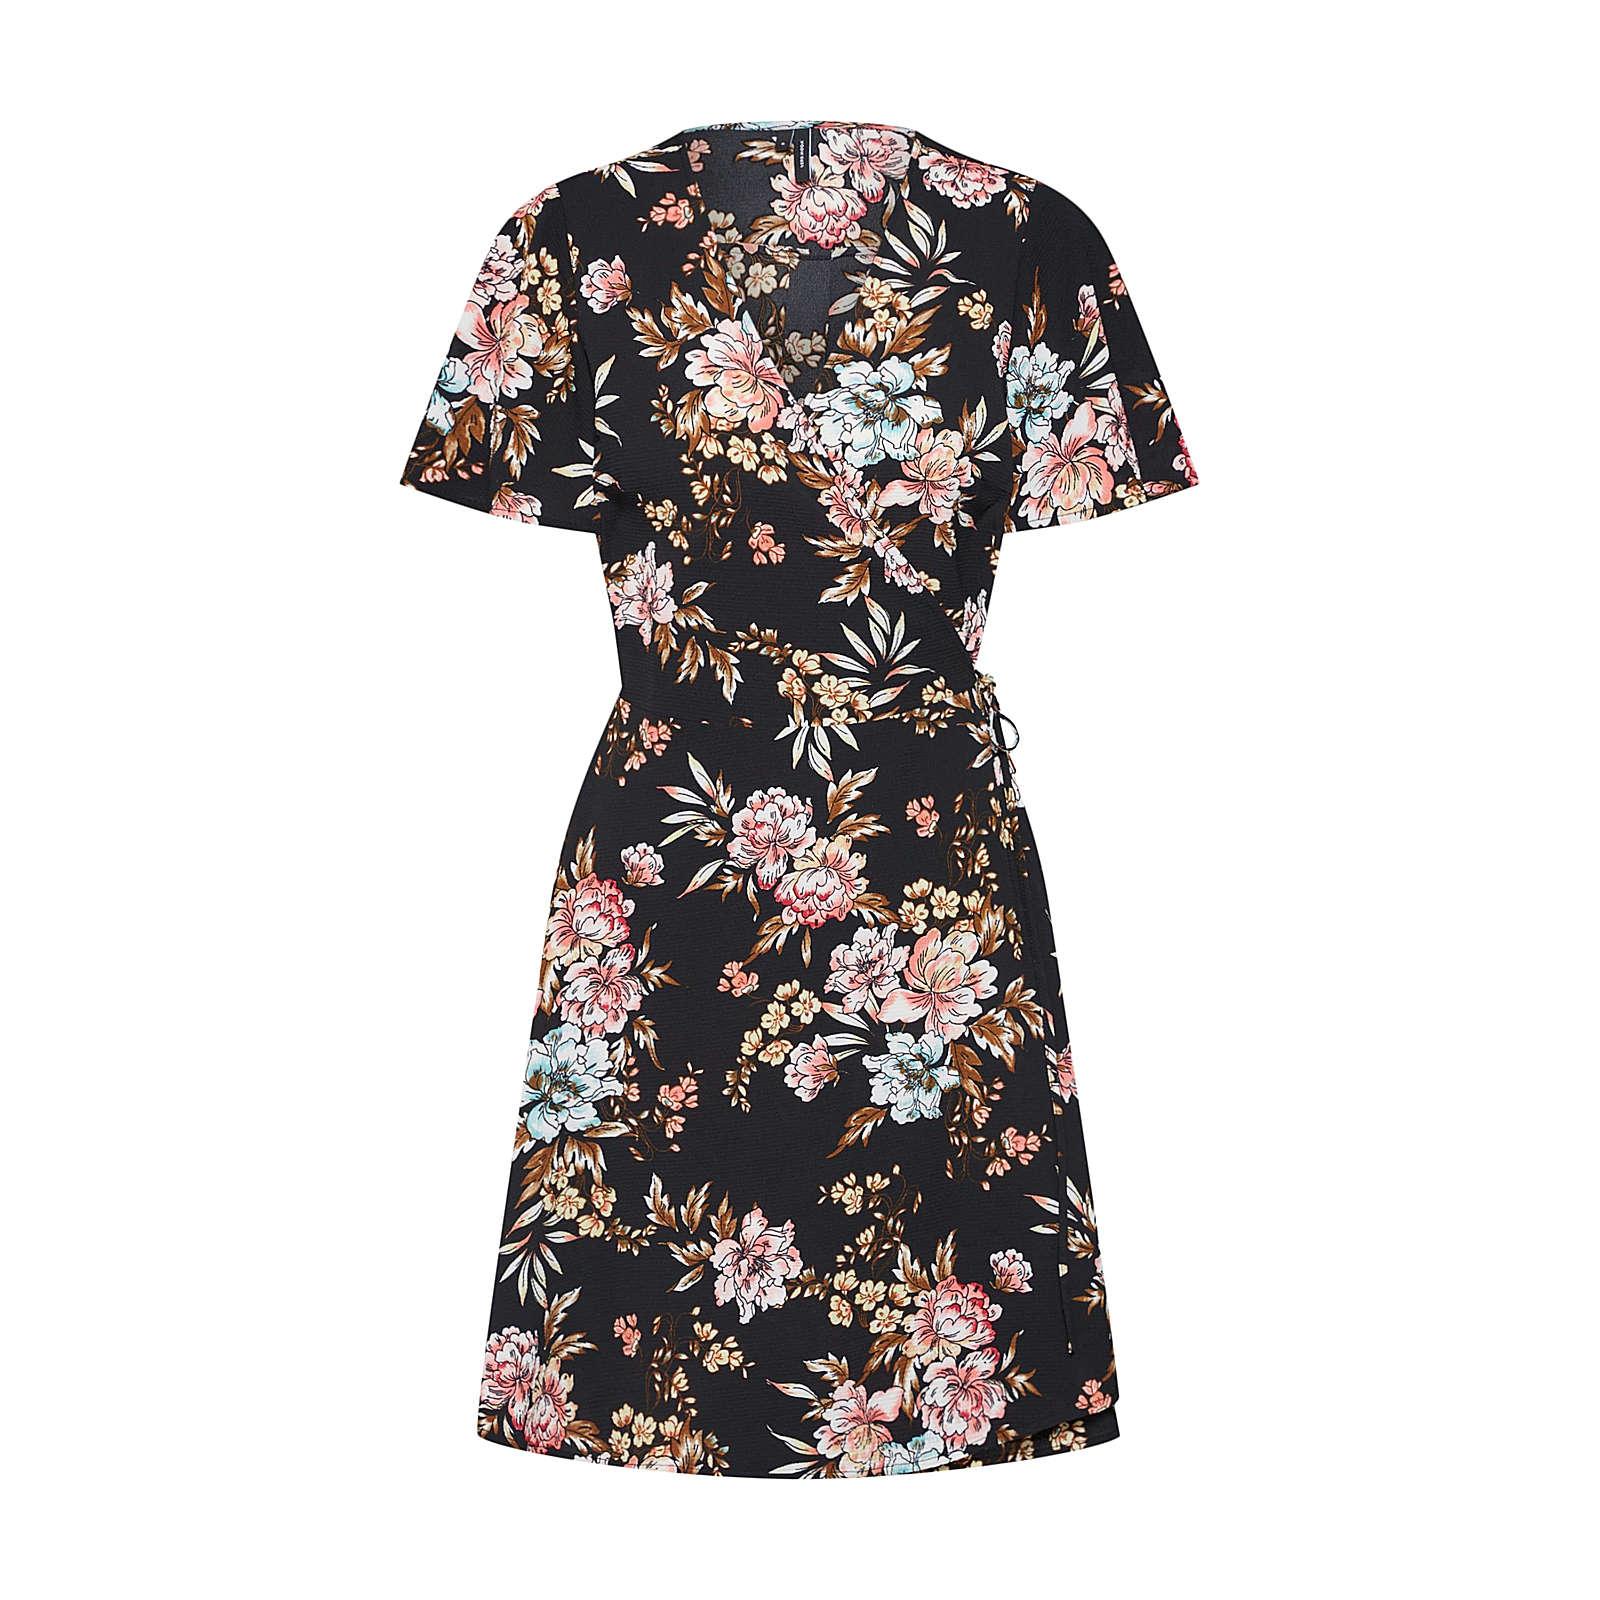 VERO MODA Kleid VMSASHA S/S SHORT WRAP DRESS EXP Kleider schwarz Damen Gr. 34